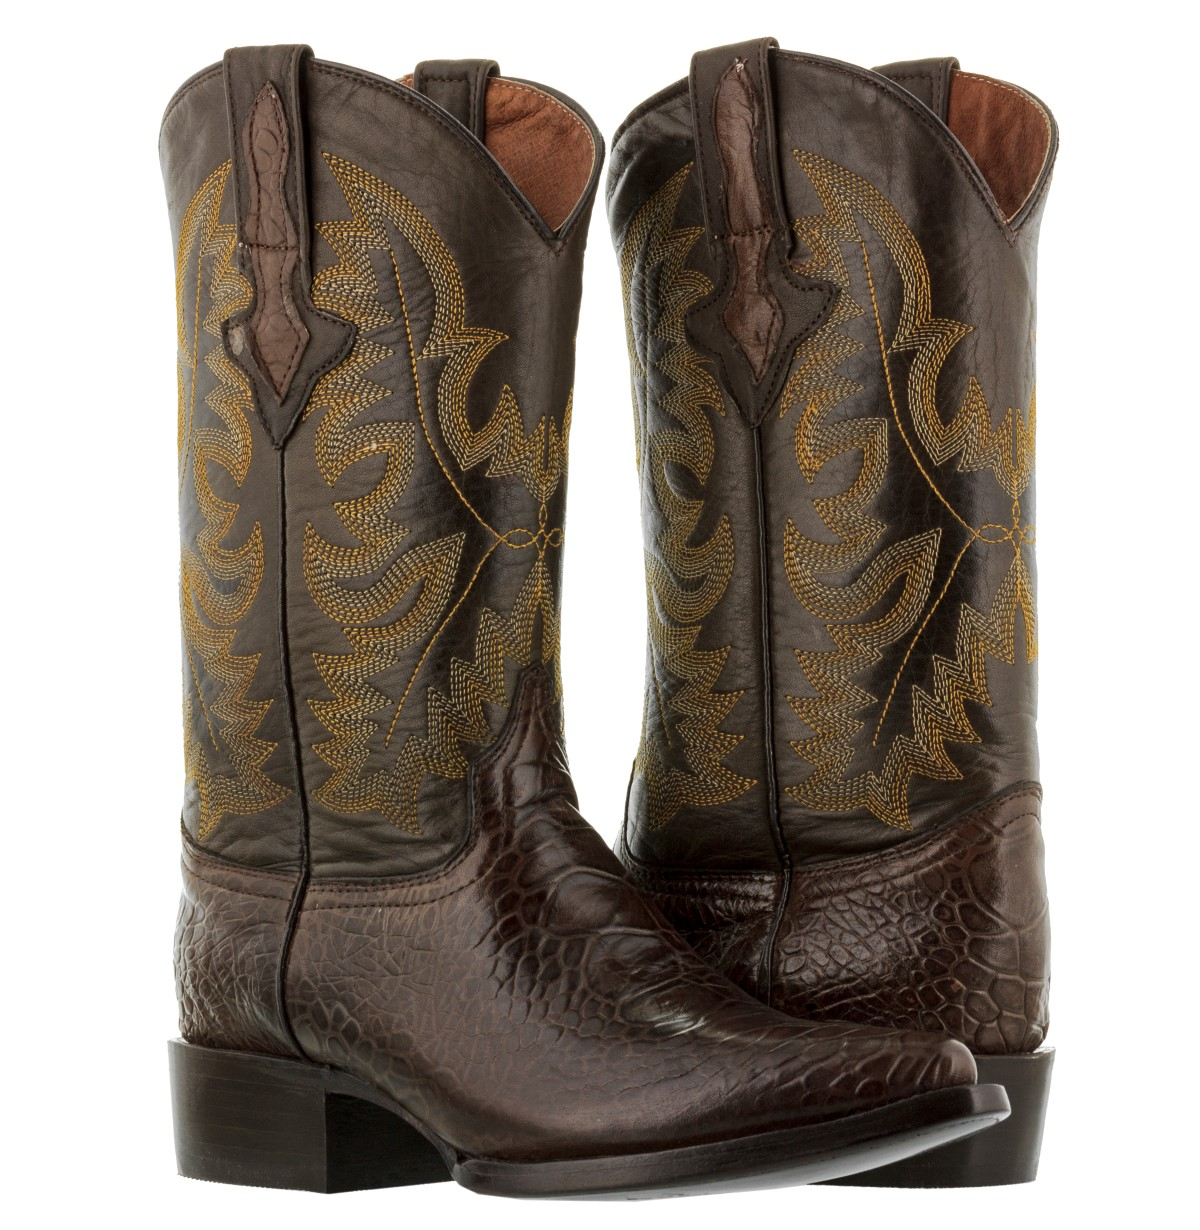 mens beige sand western ostrich pattern cowboy boots alligator ranch j toe rodeo